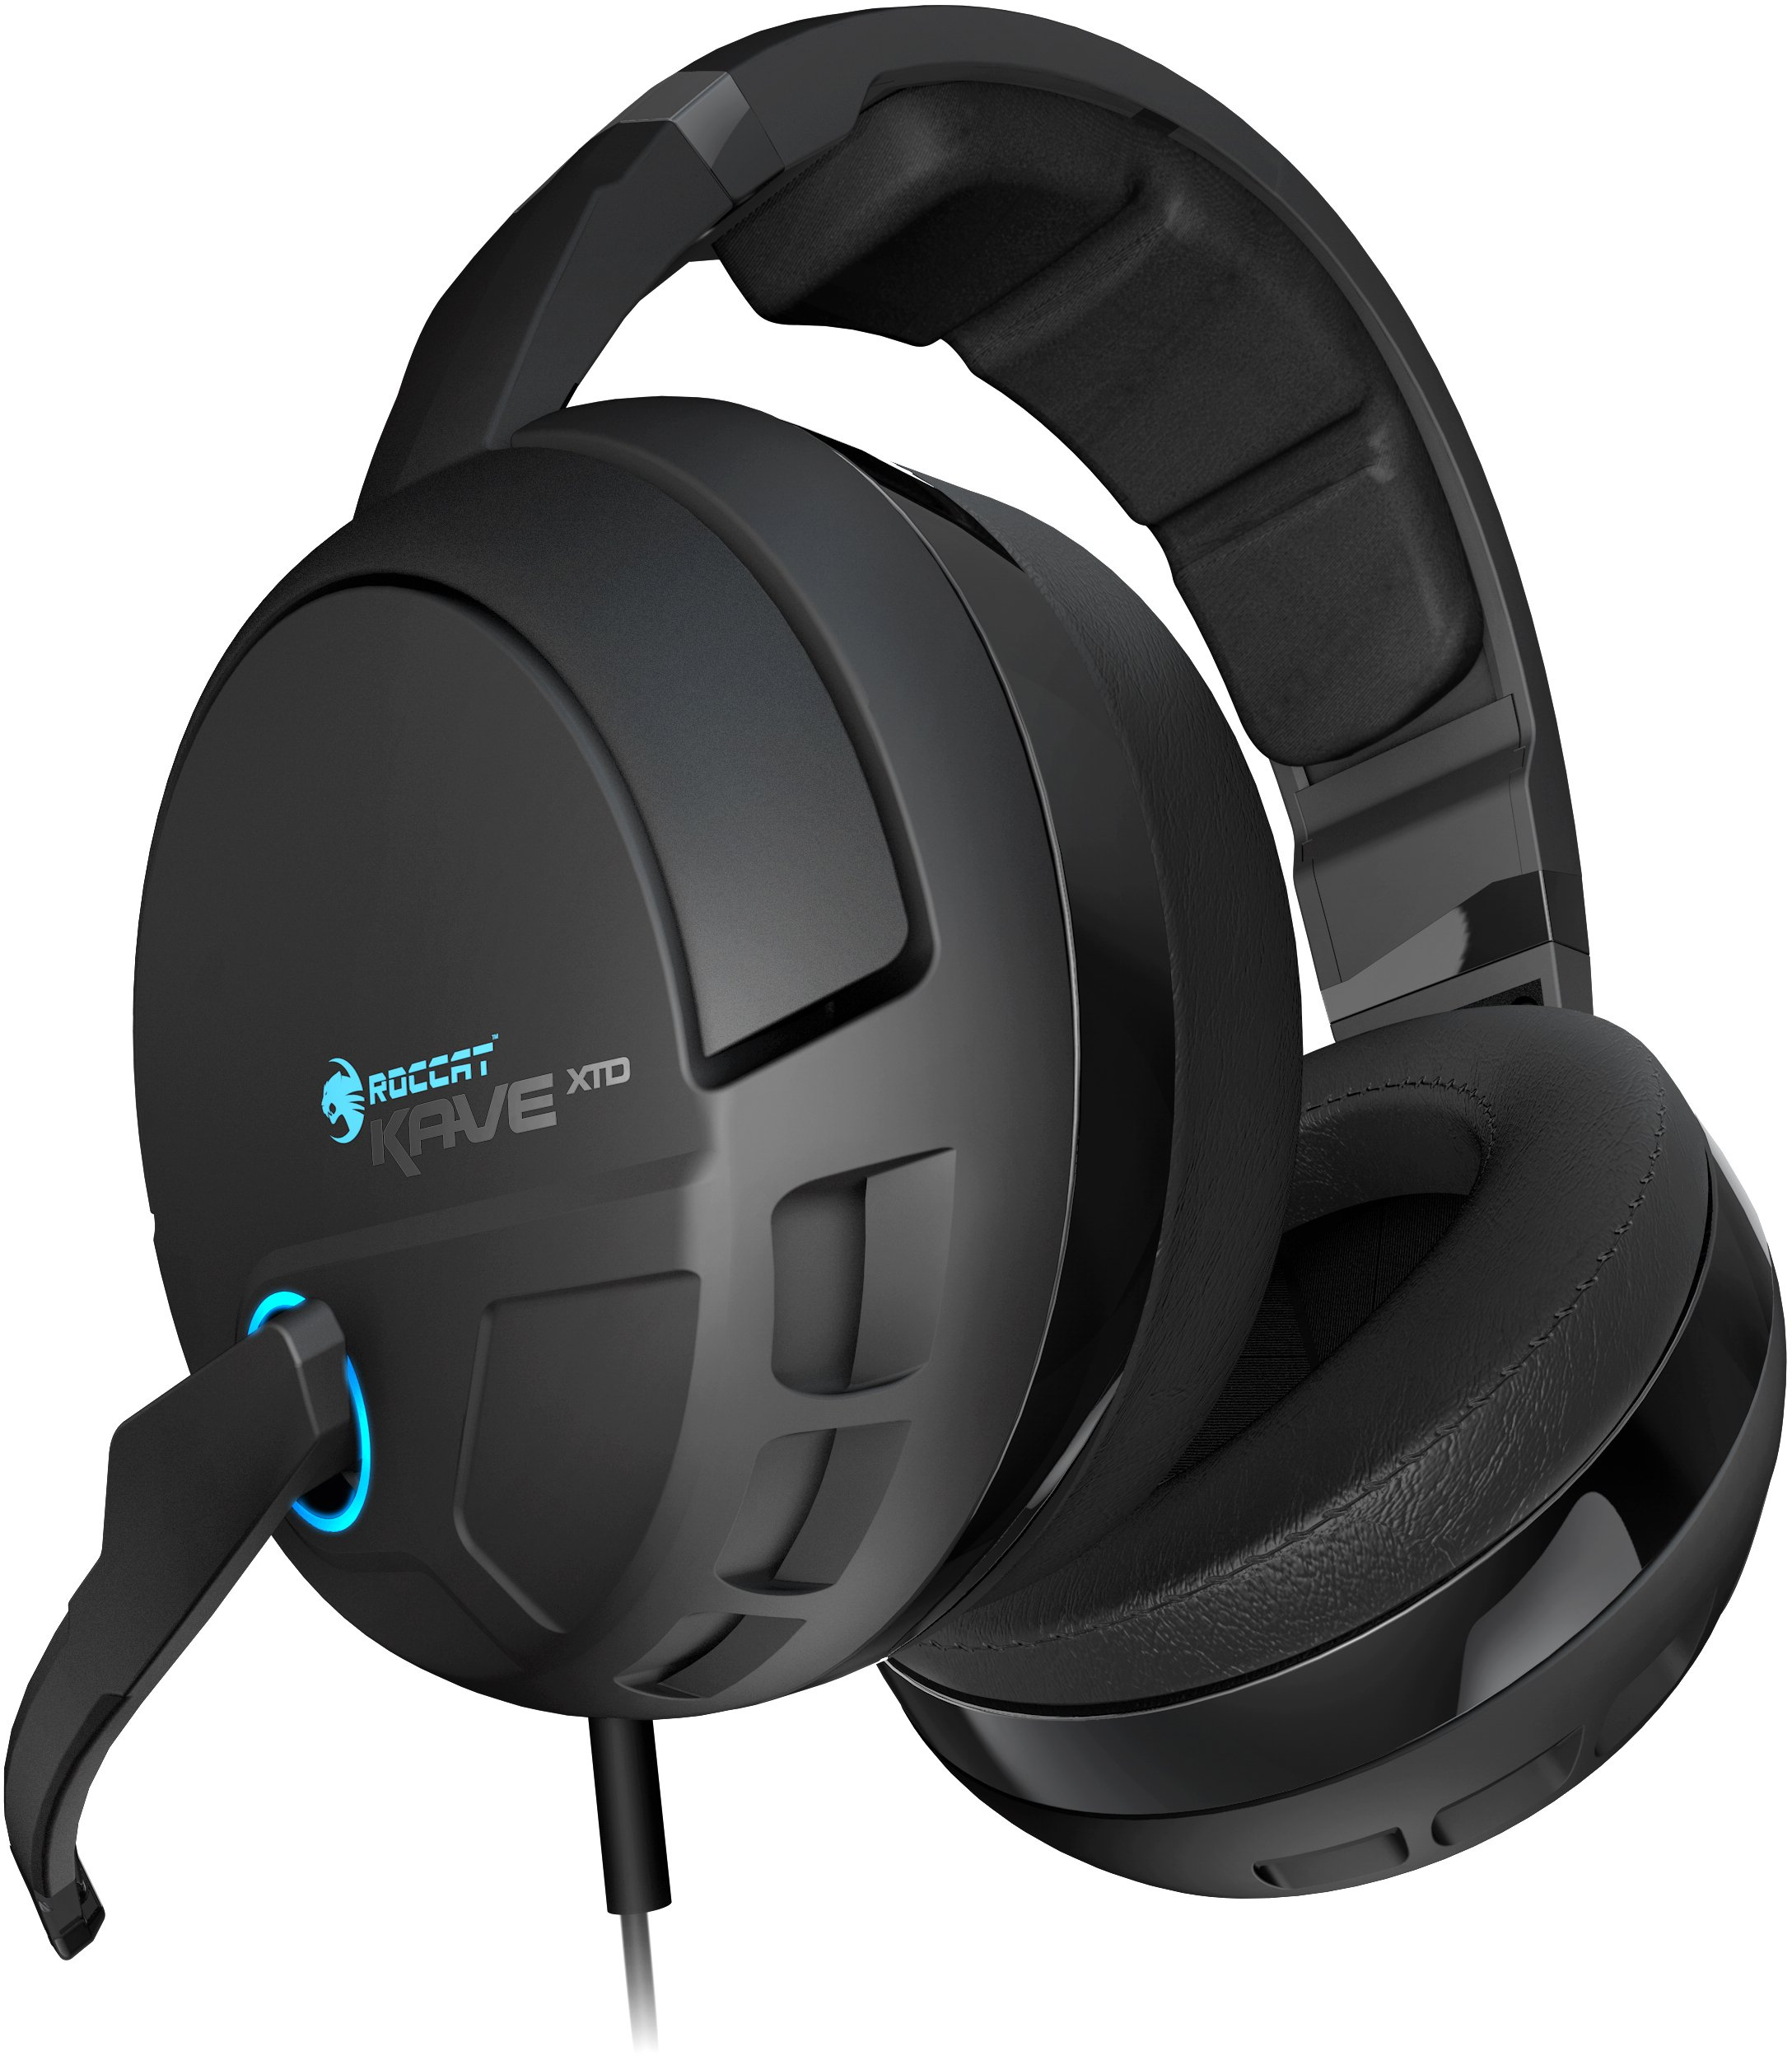 ROCCAT KAVE XTD 5.1 Digital – Premium 5.1 Surround Headset with USB Remote & Sound Card by ROCCAT